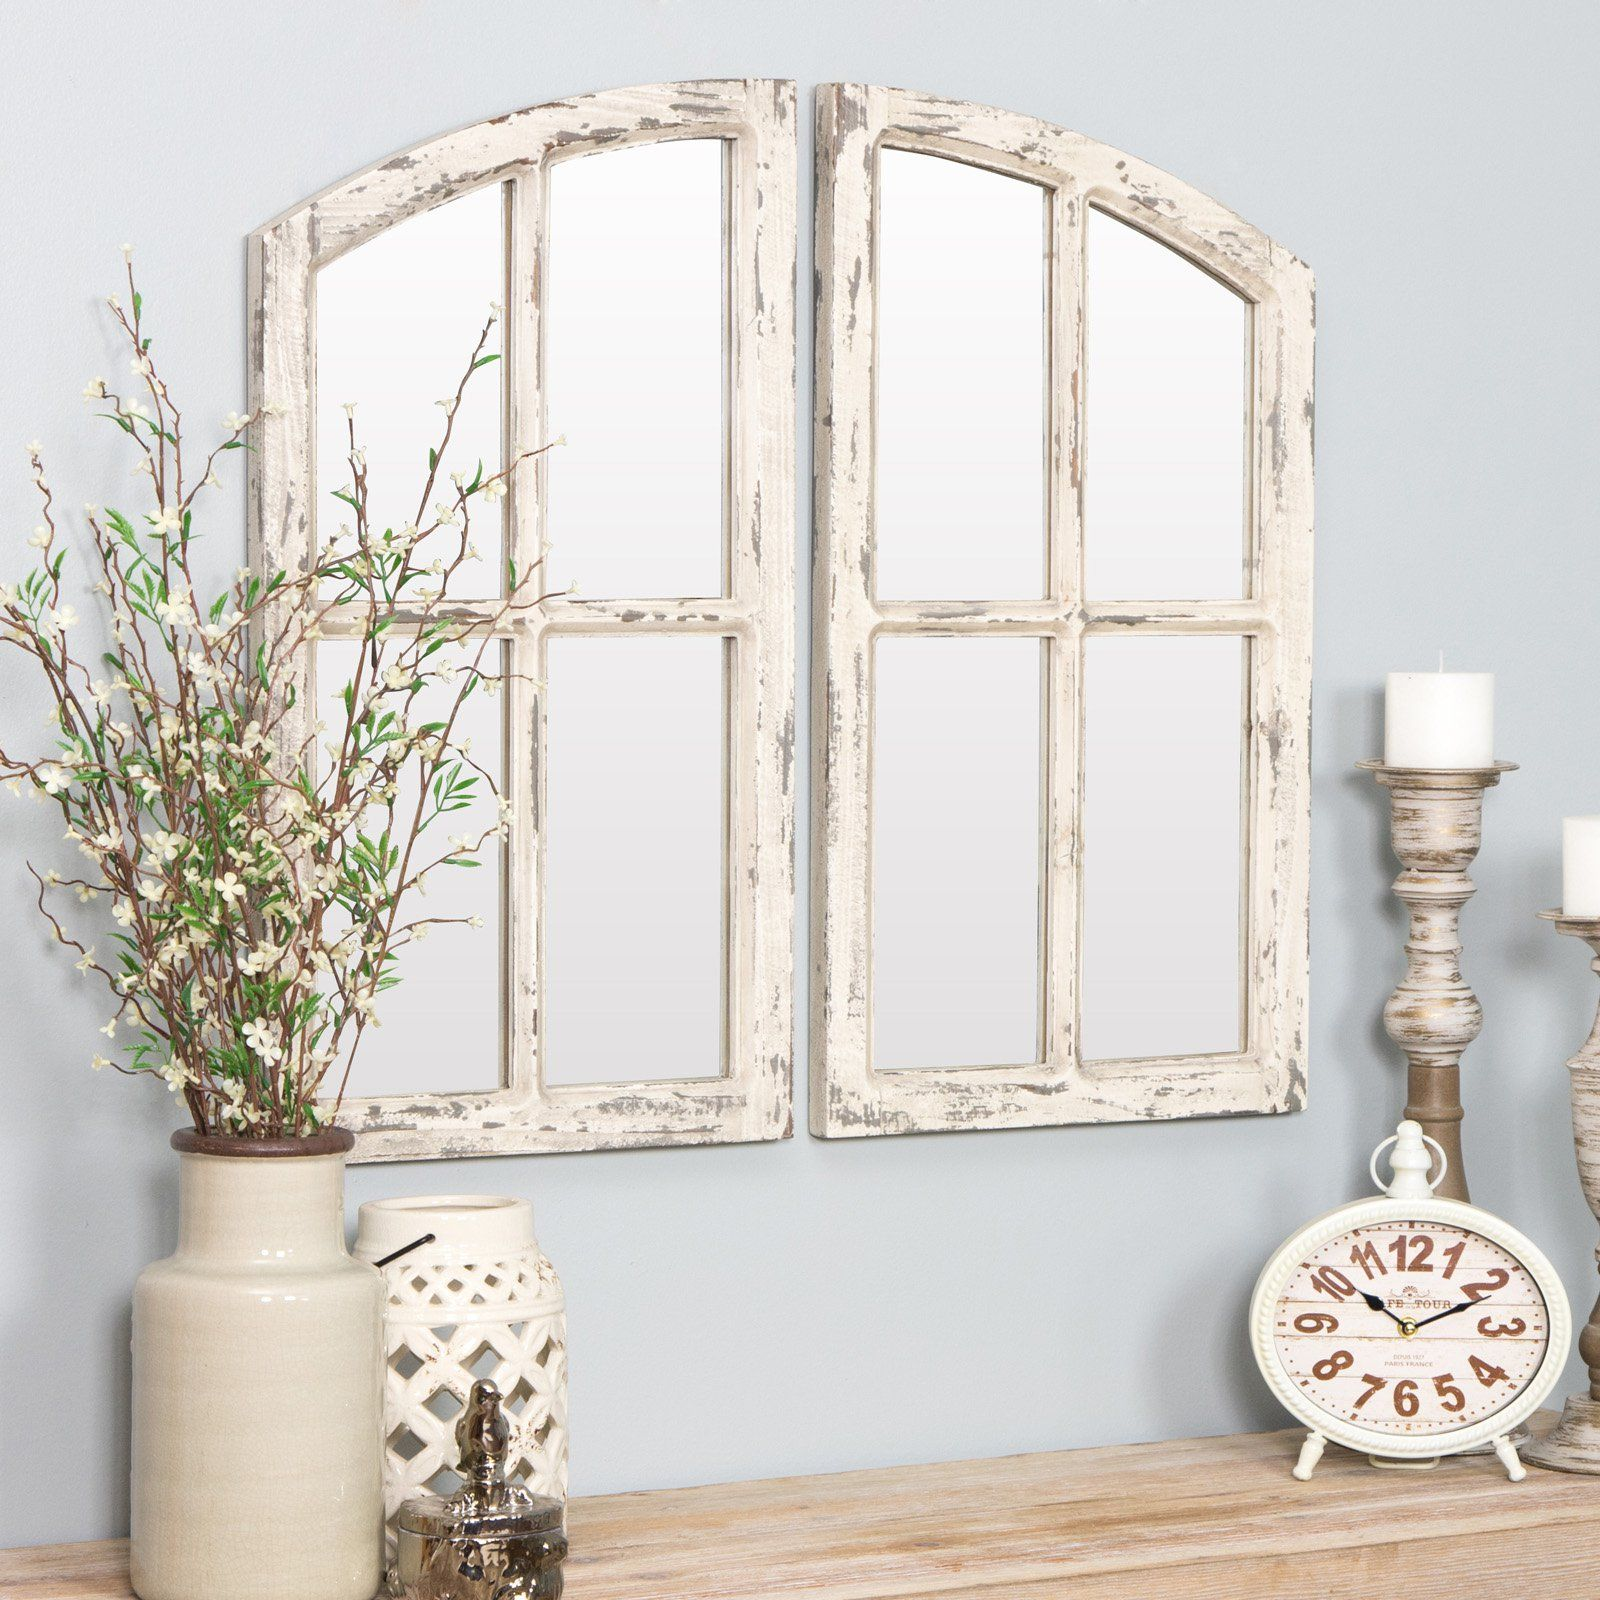 Aspire Home Accents Jolene Arch Window Pane Mirror Set Of 2 15w X 27h In In 2019 Window